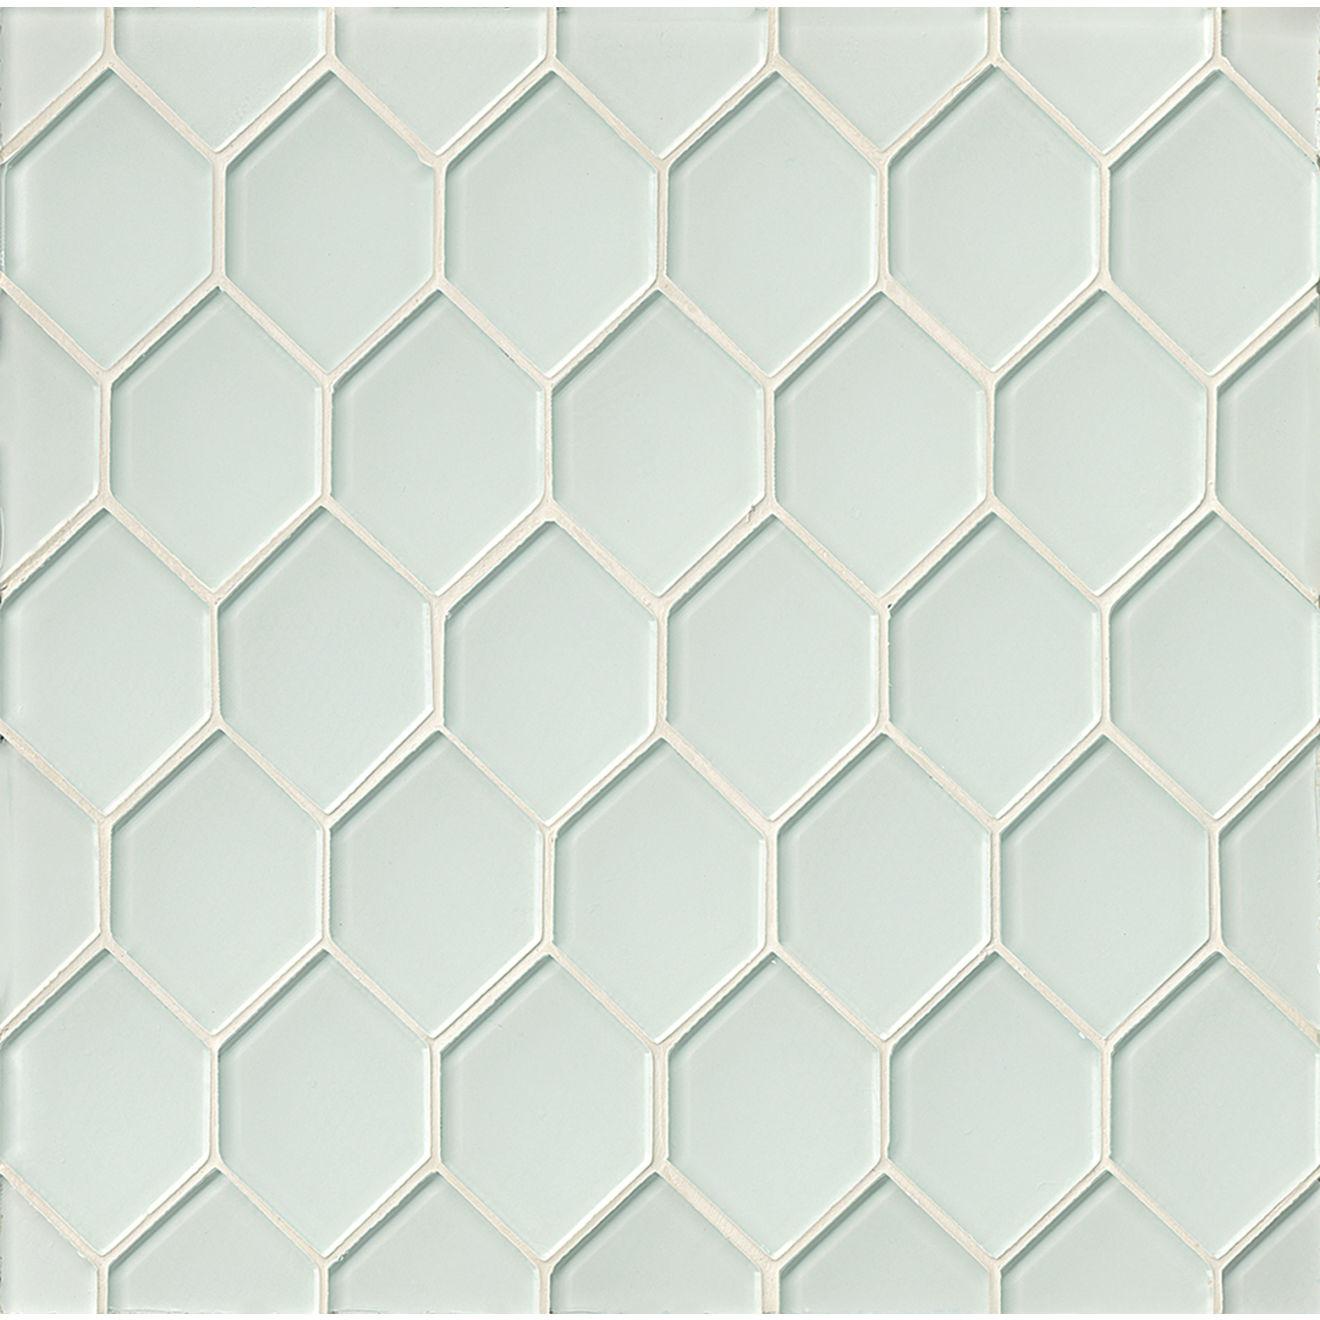 Mallorca Glass Wall Mosaic in White Linen